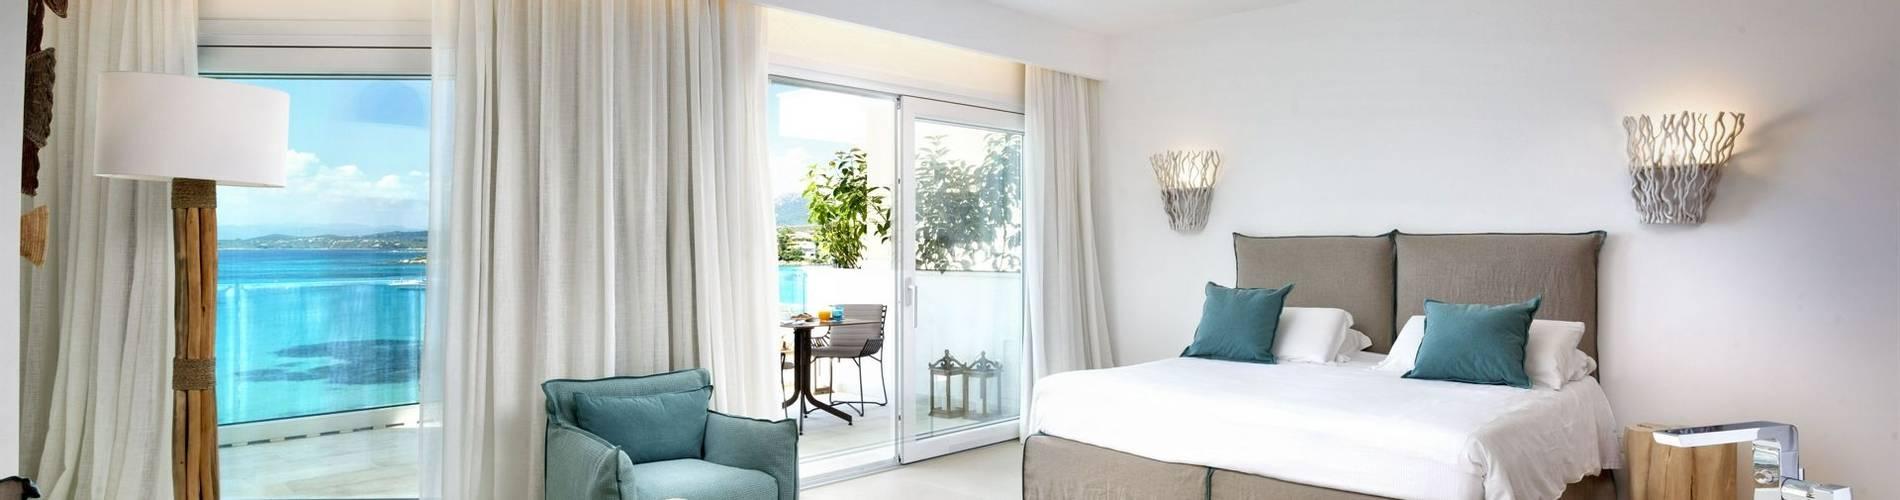 Pool Suite - Gabbiano Azzurro Hotel Sardinia3.jpg